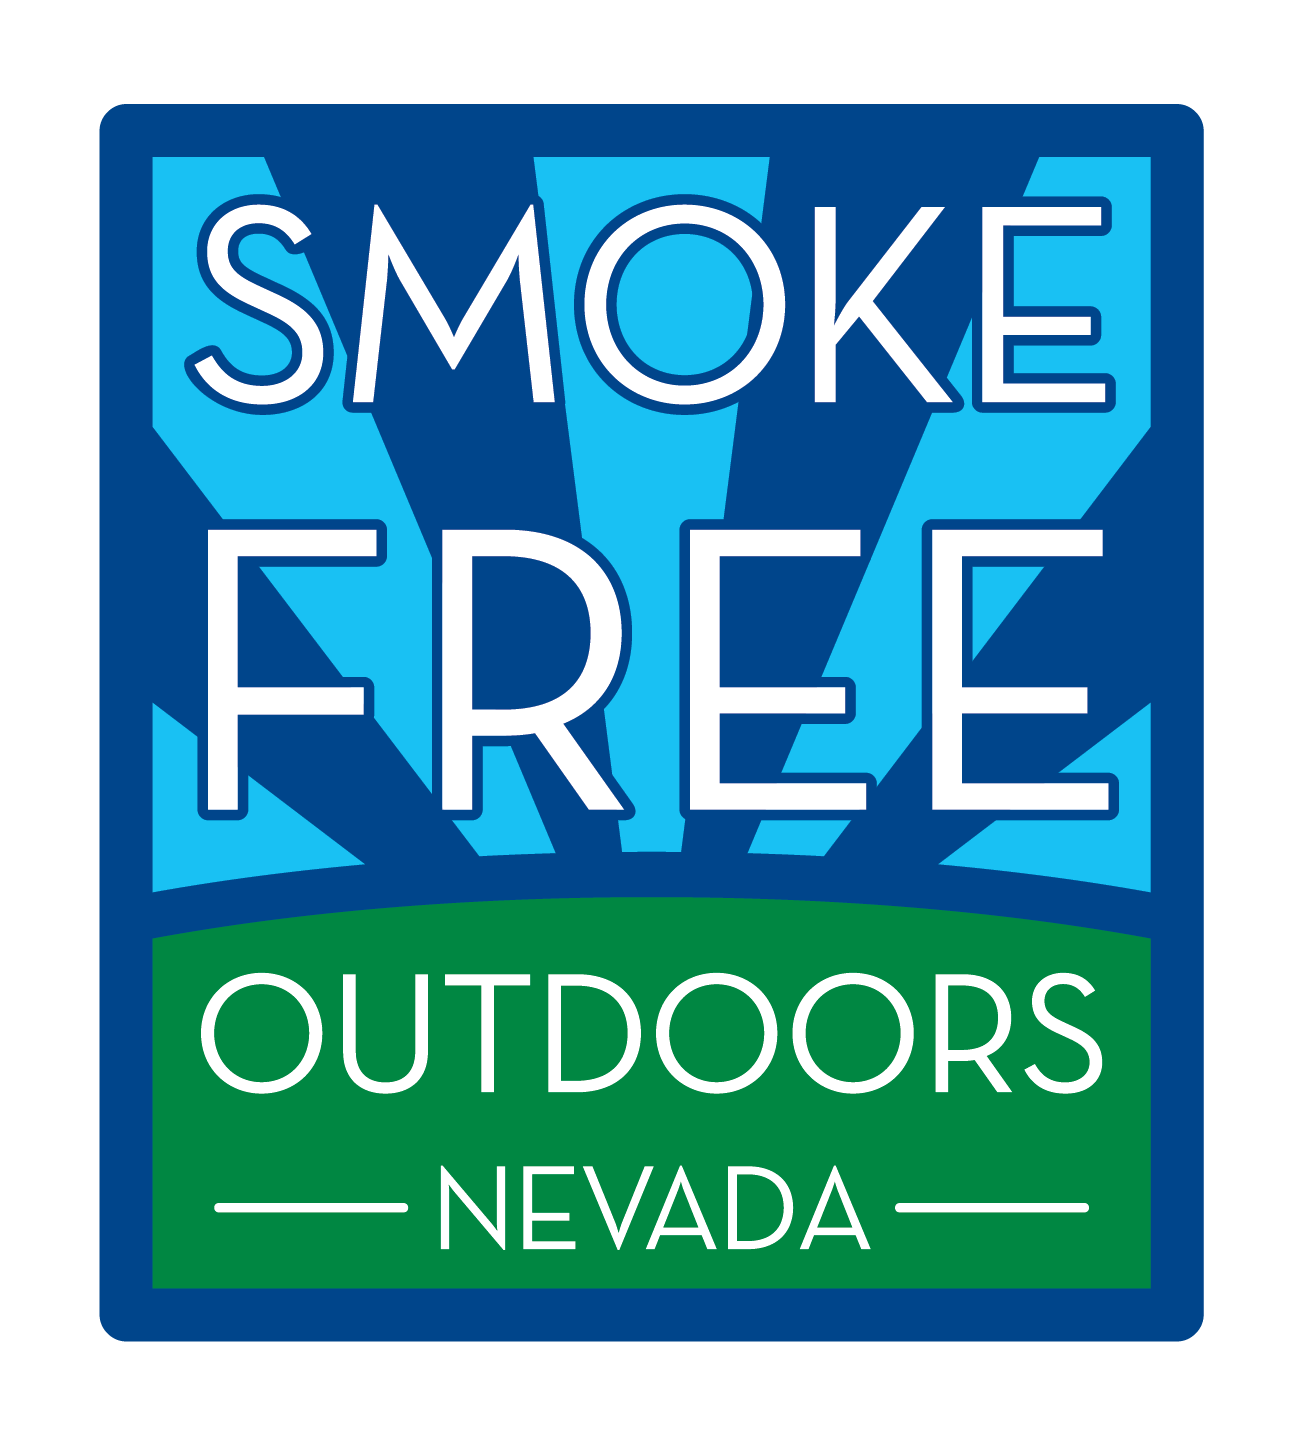 Smoke Free Outdoors Nevada